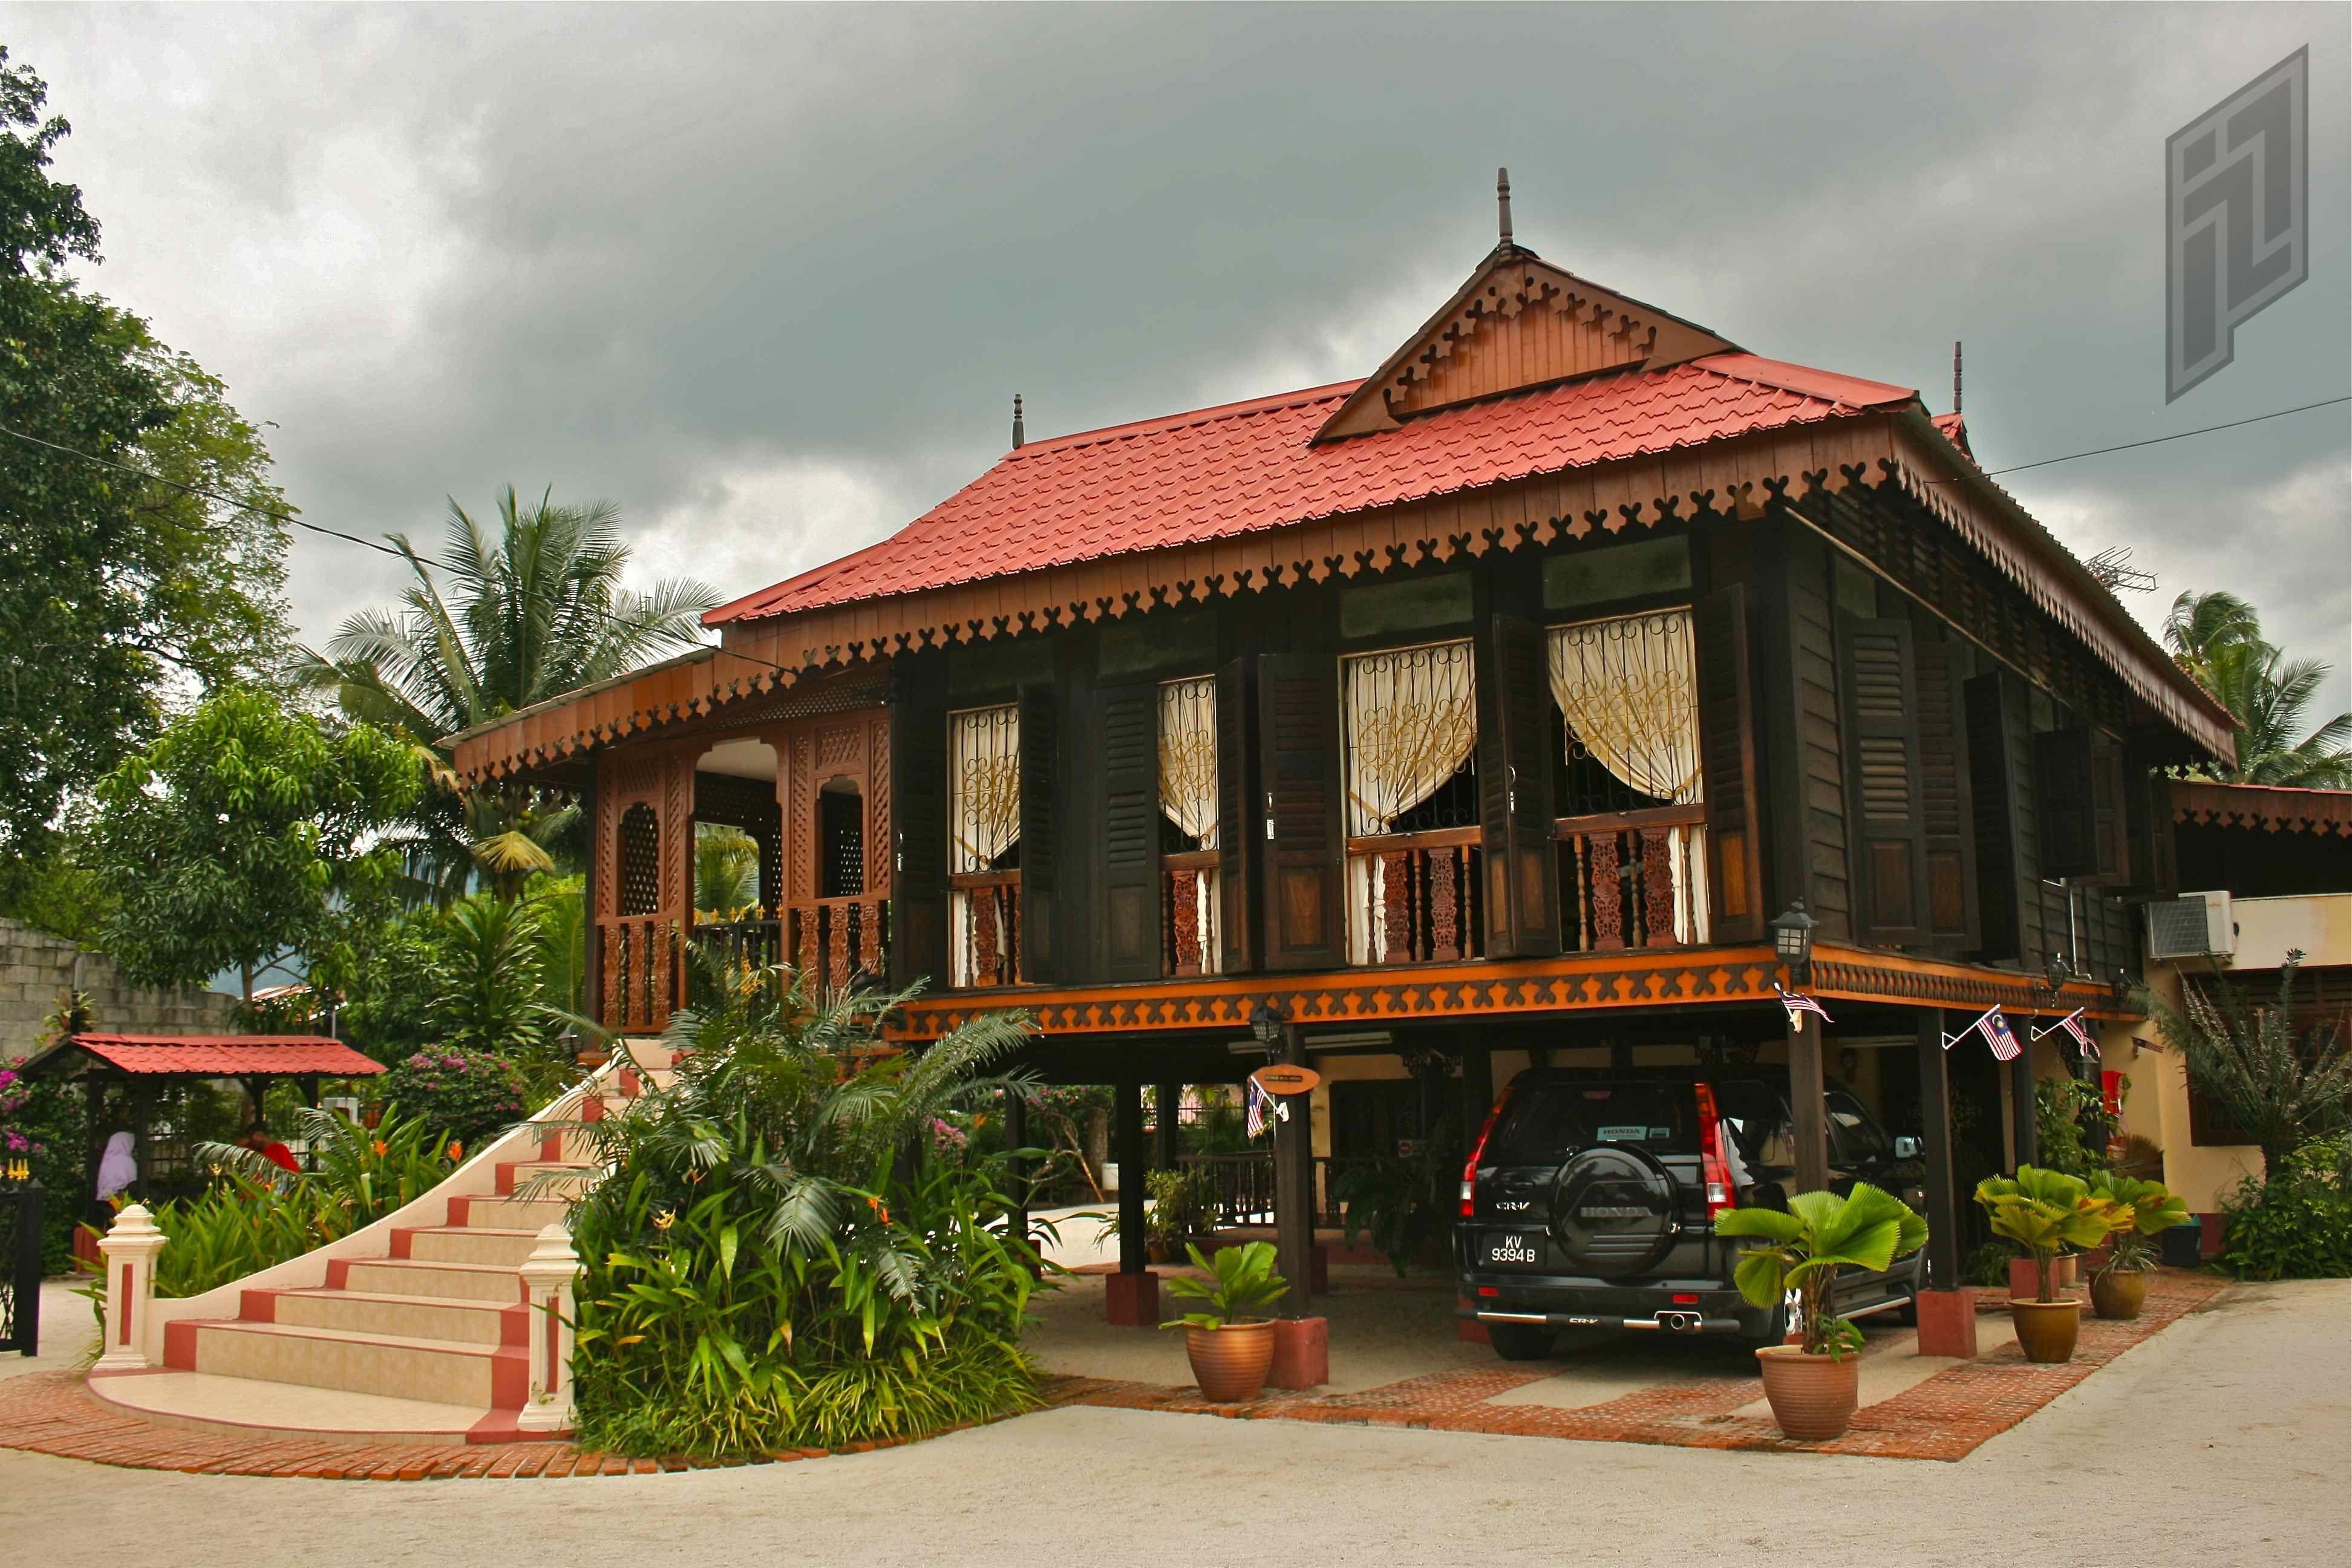 Malay Traditional House Langkawi Malaysia Photography House